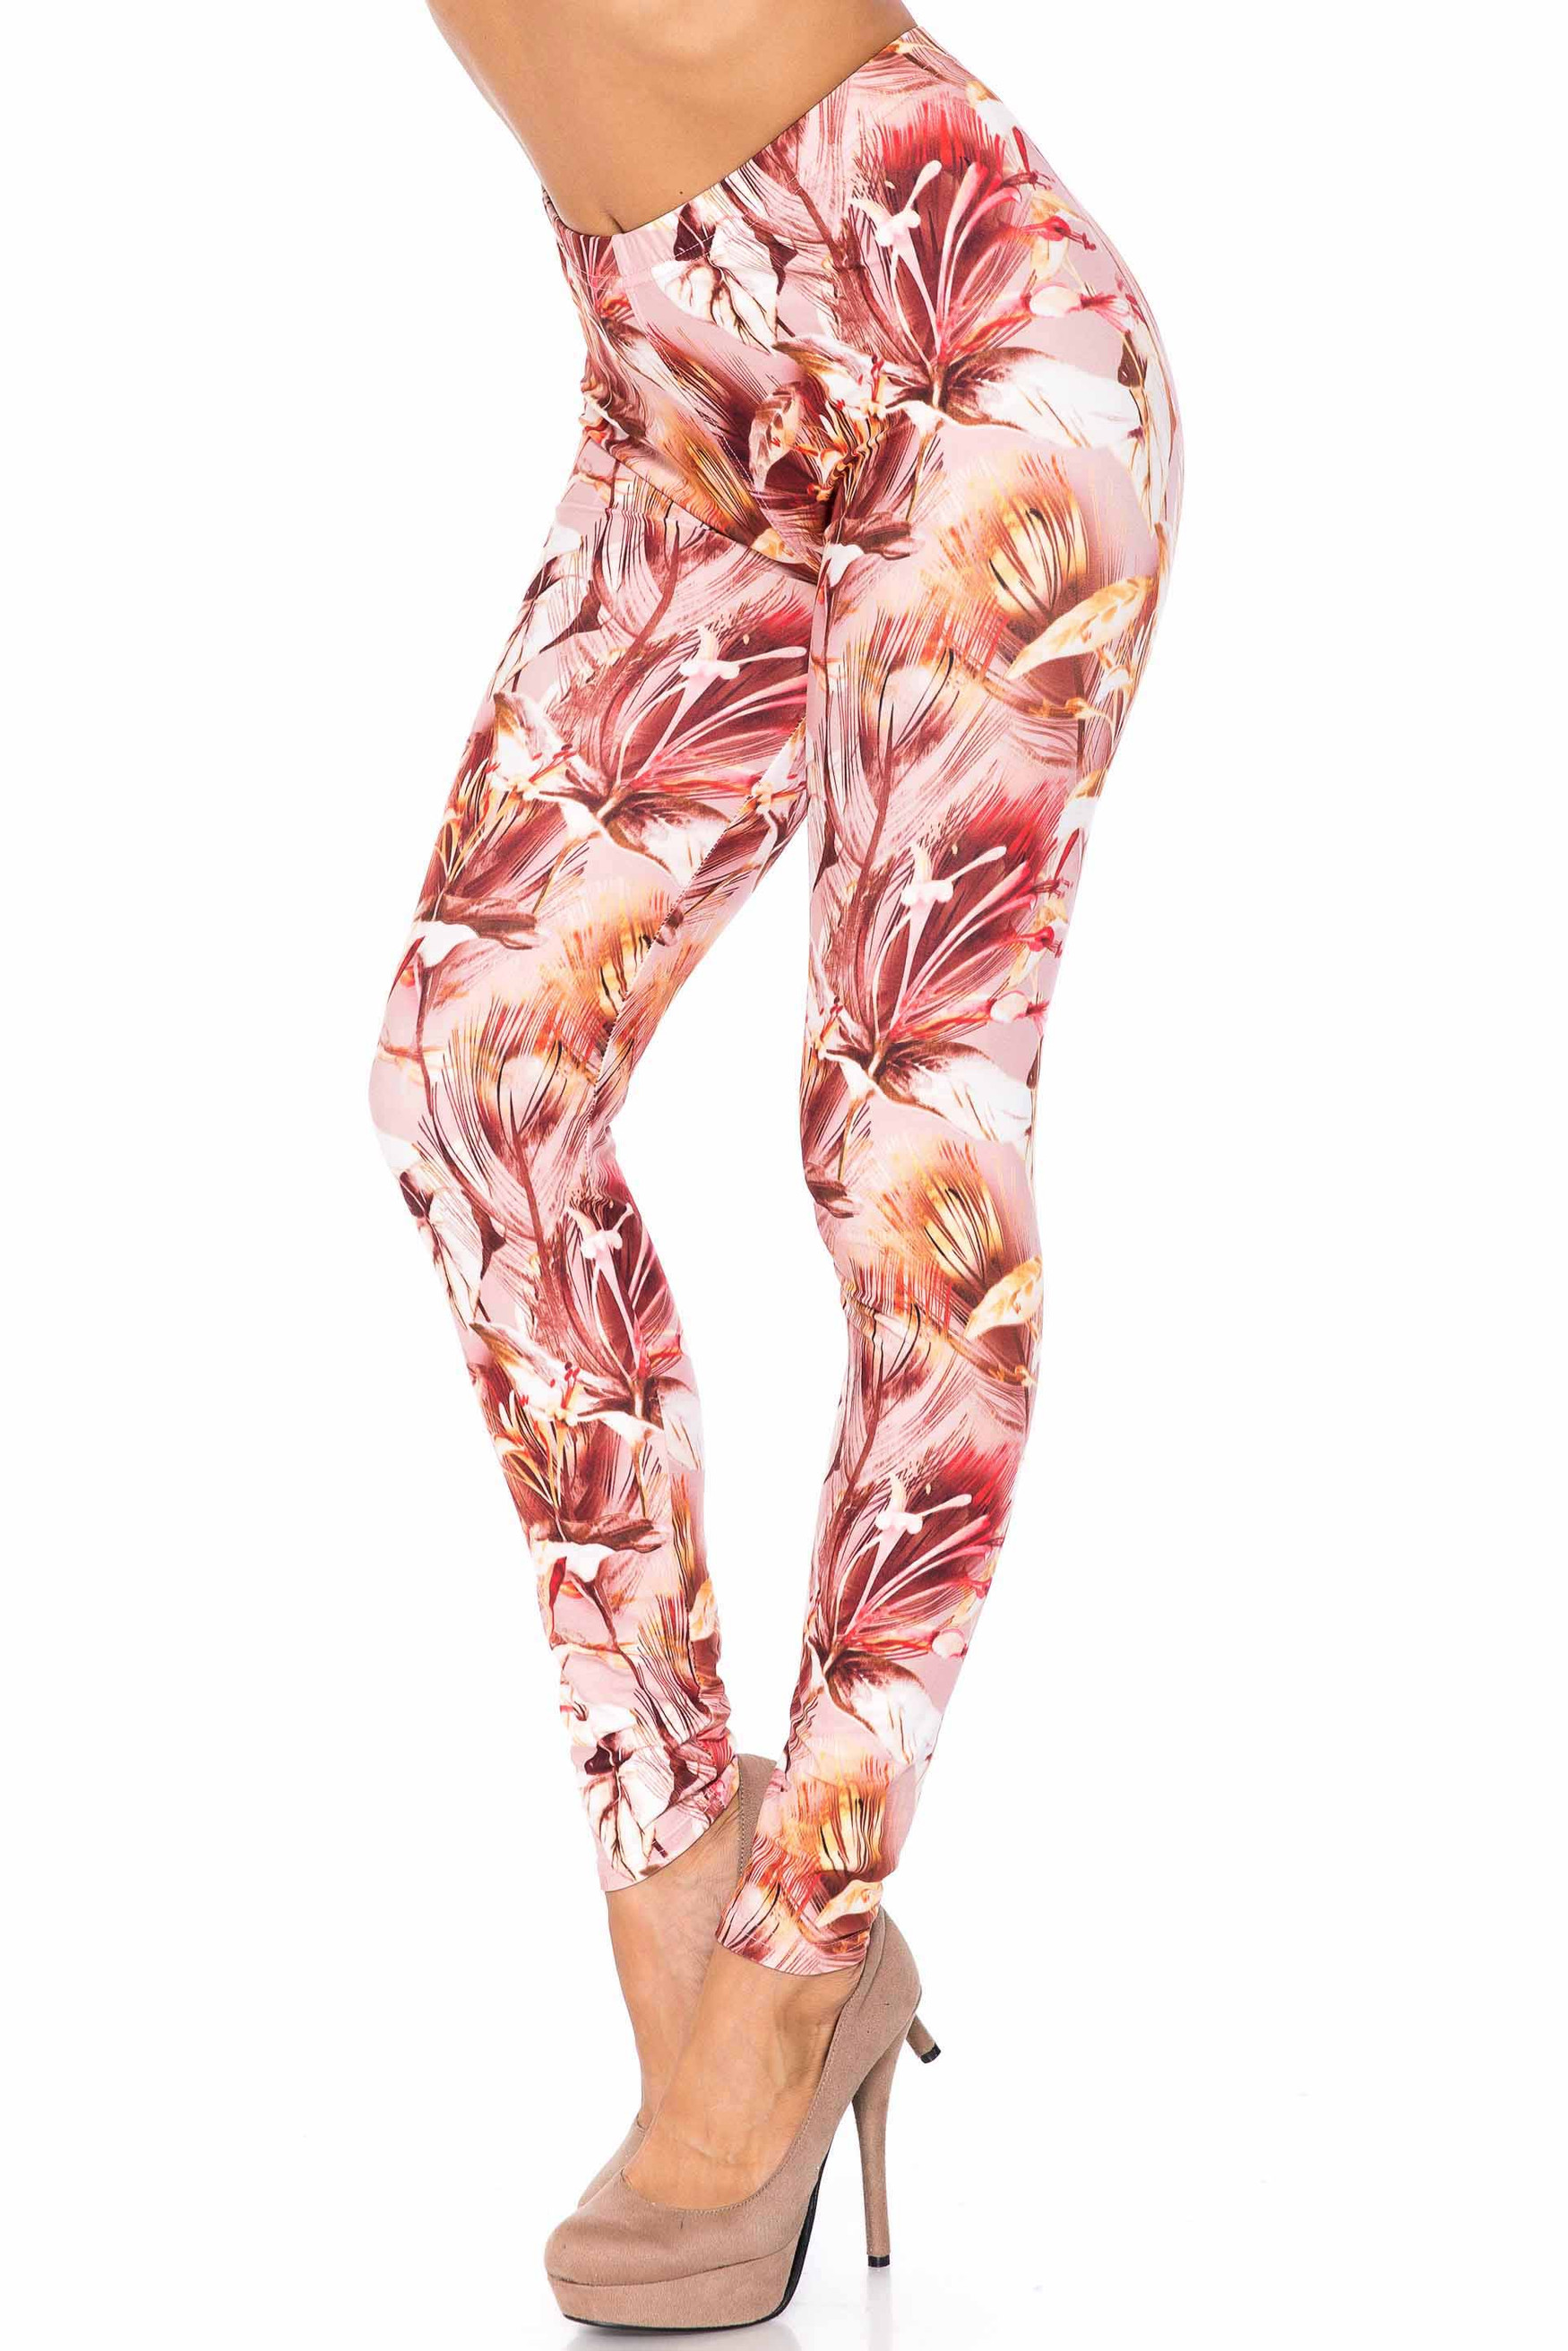 Creamy Soft Mocha Floral Plus Size Leggings - USA Fashion™